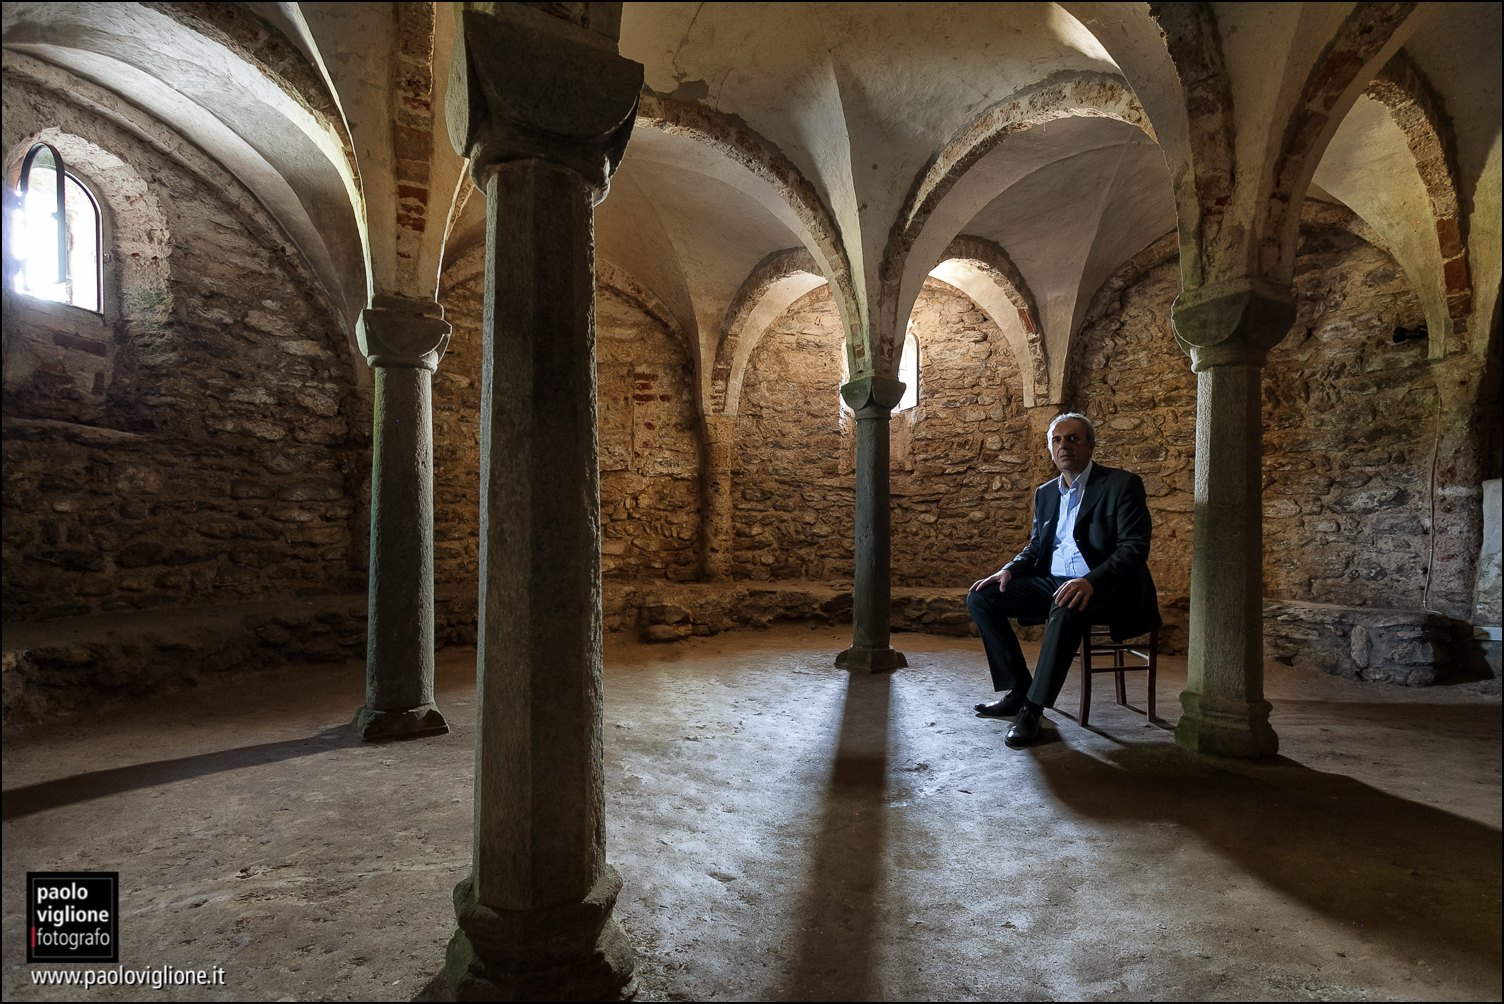 Giuseppe Bottero, guida turistica, Villan San Costanzo